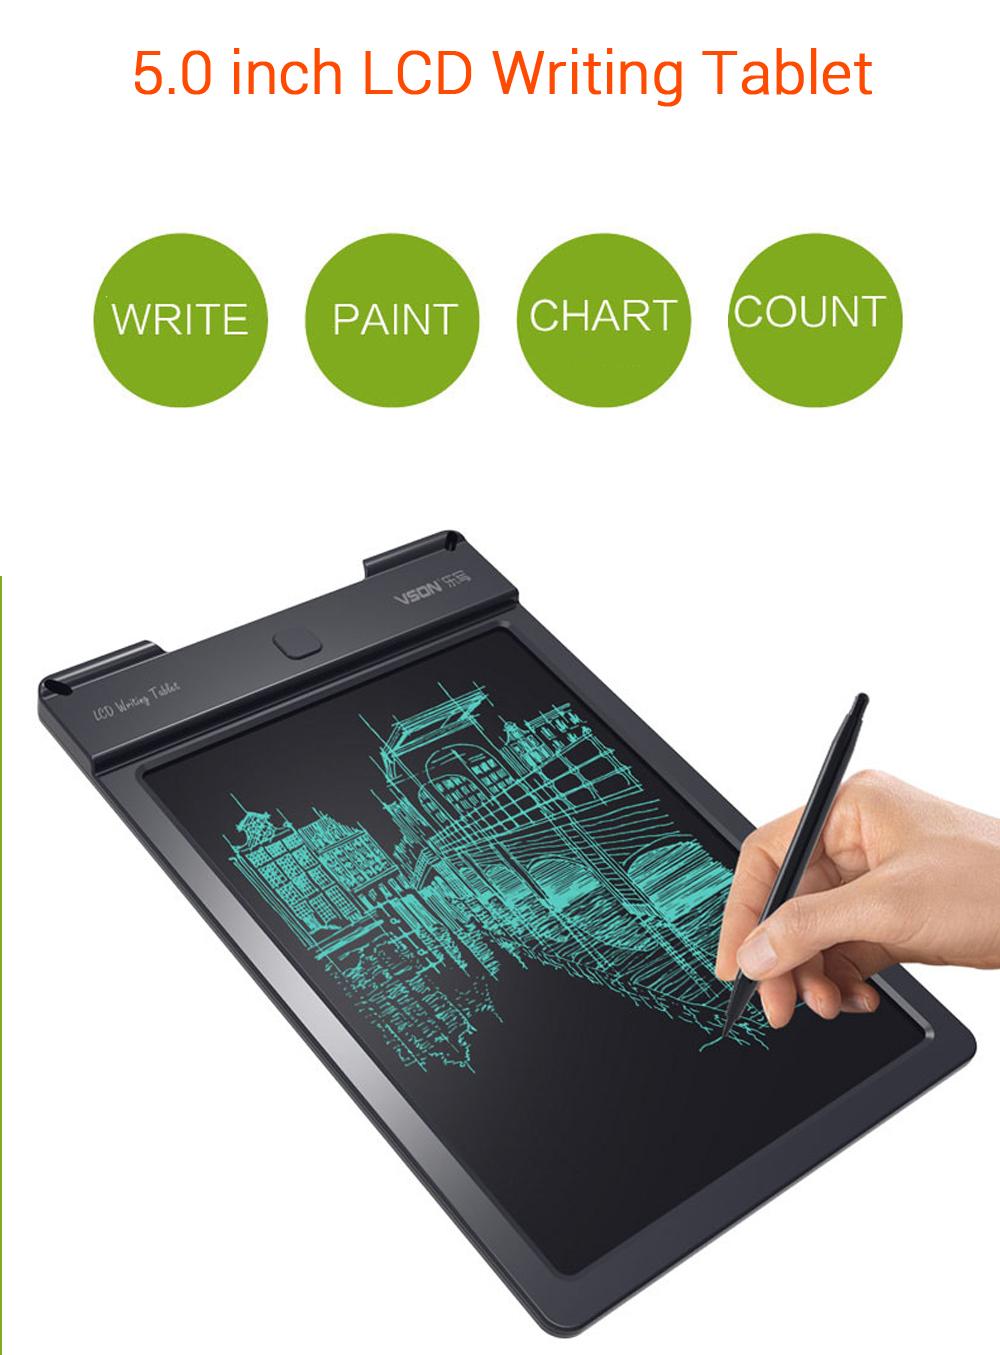 LCD Pad eWriter Learn to Write Writing Board Kids Drawing Tablet Stylus Pen UK